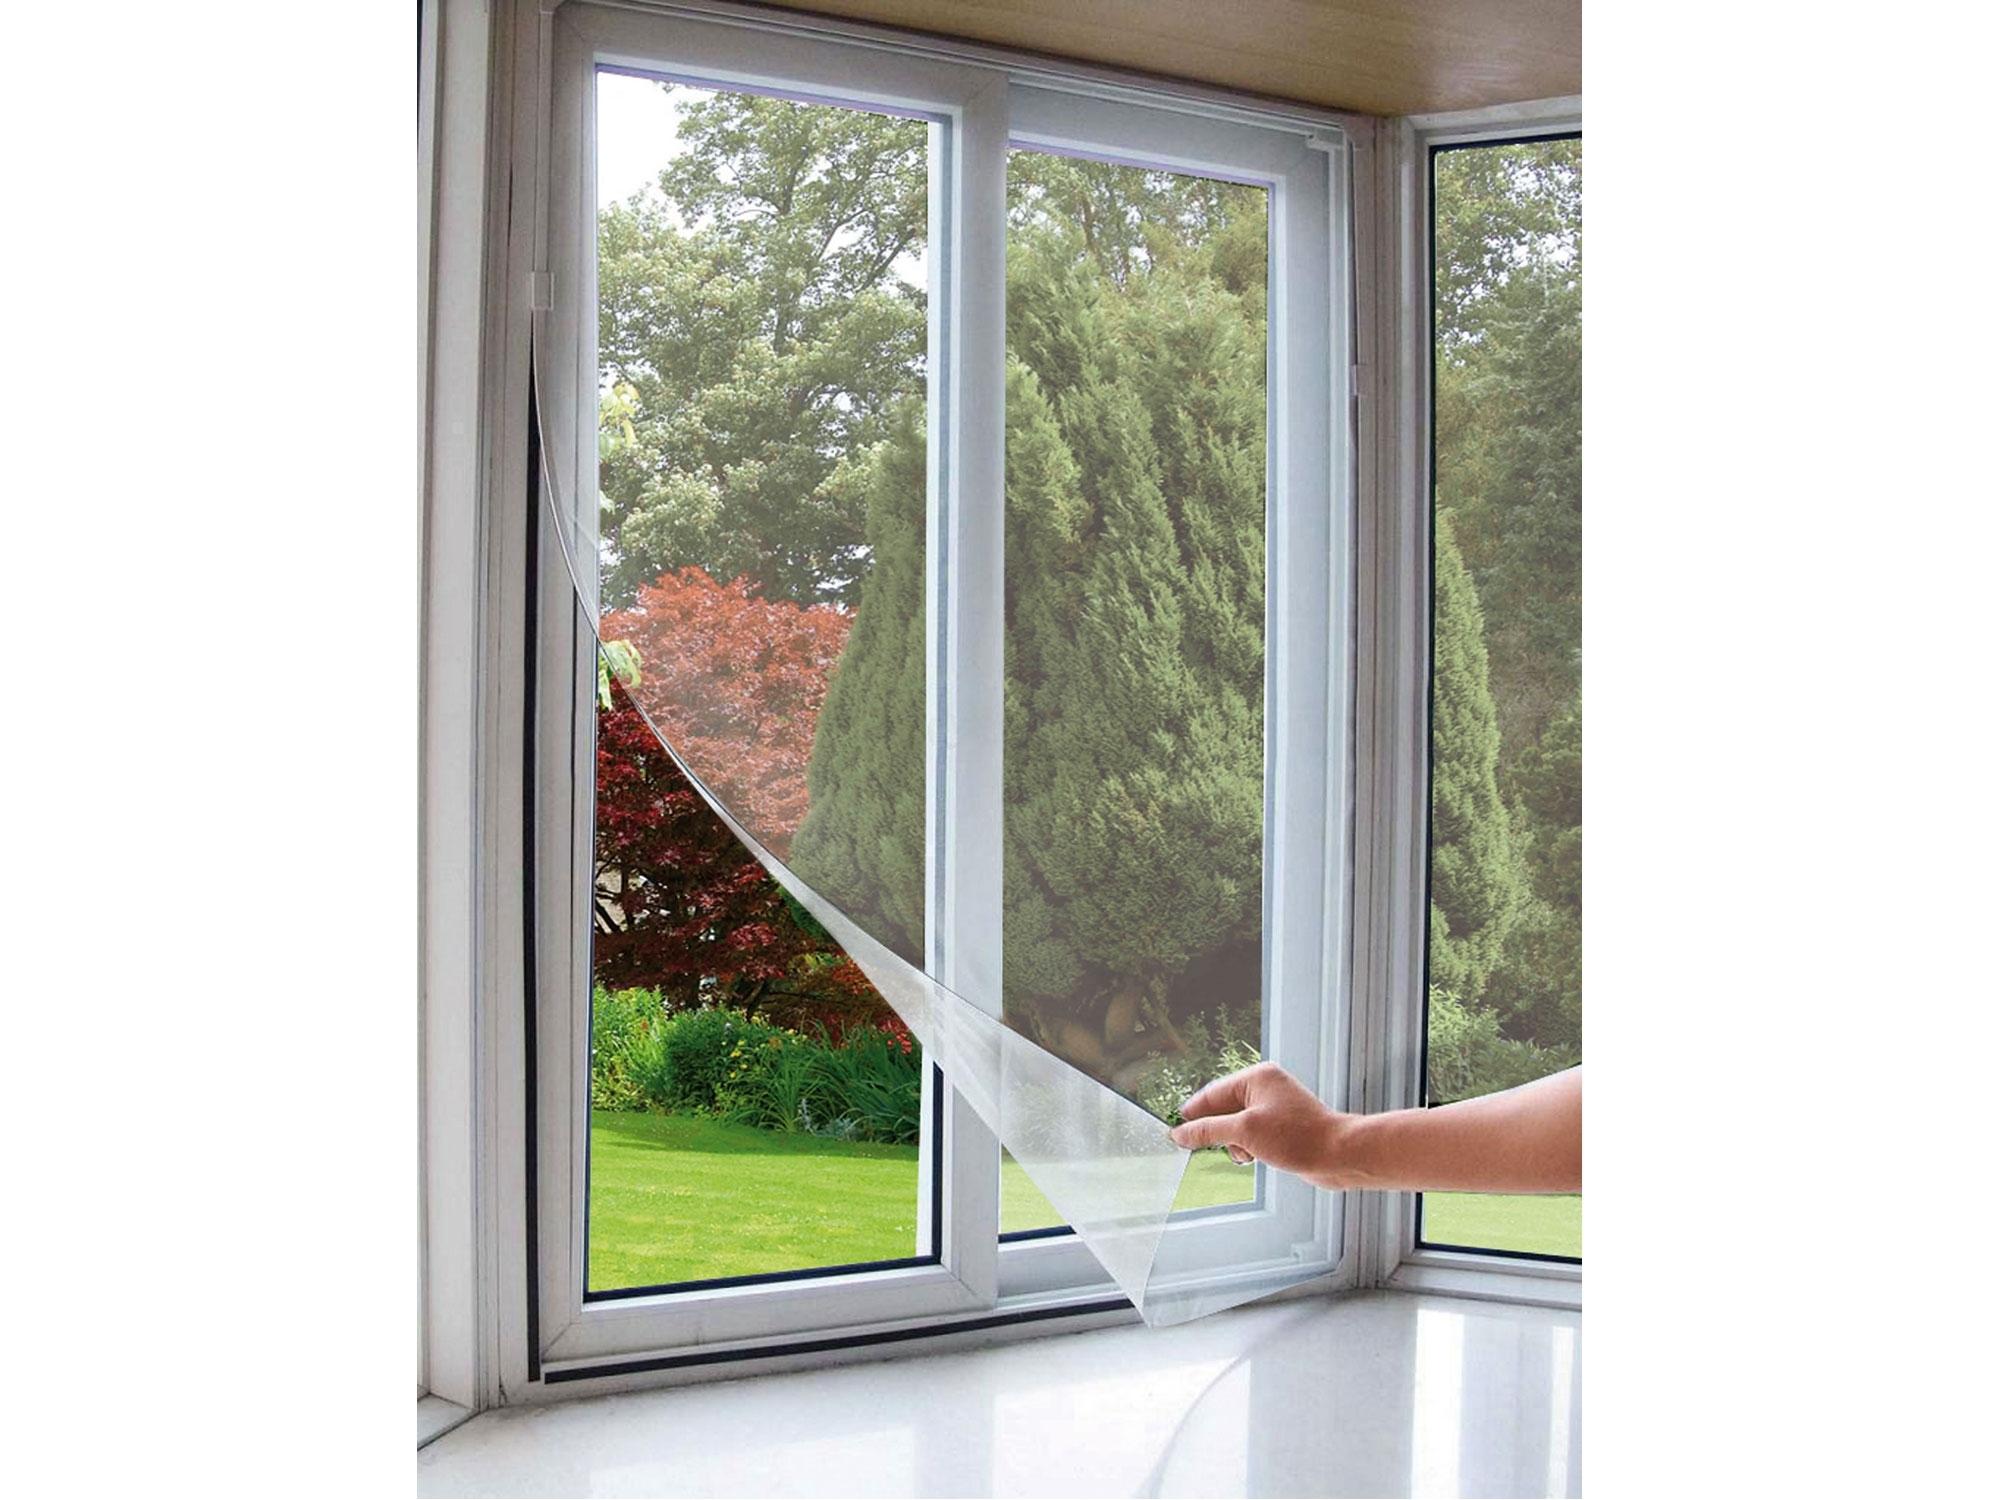 síť okenní proti hmyzu, 100x130cm, bílá, PES, EXTOL CRAFT 99110